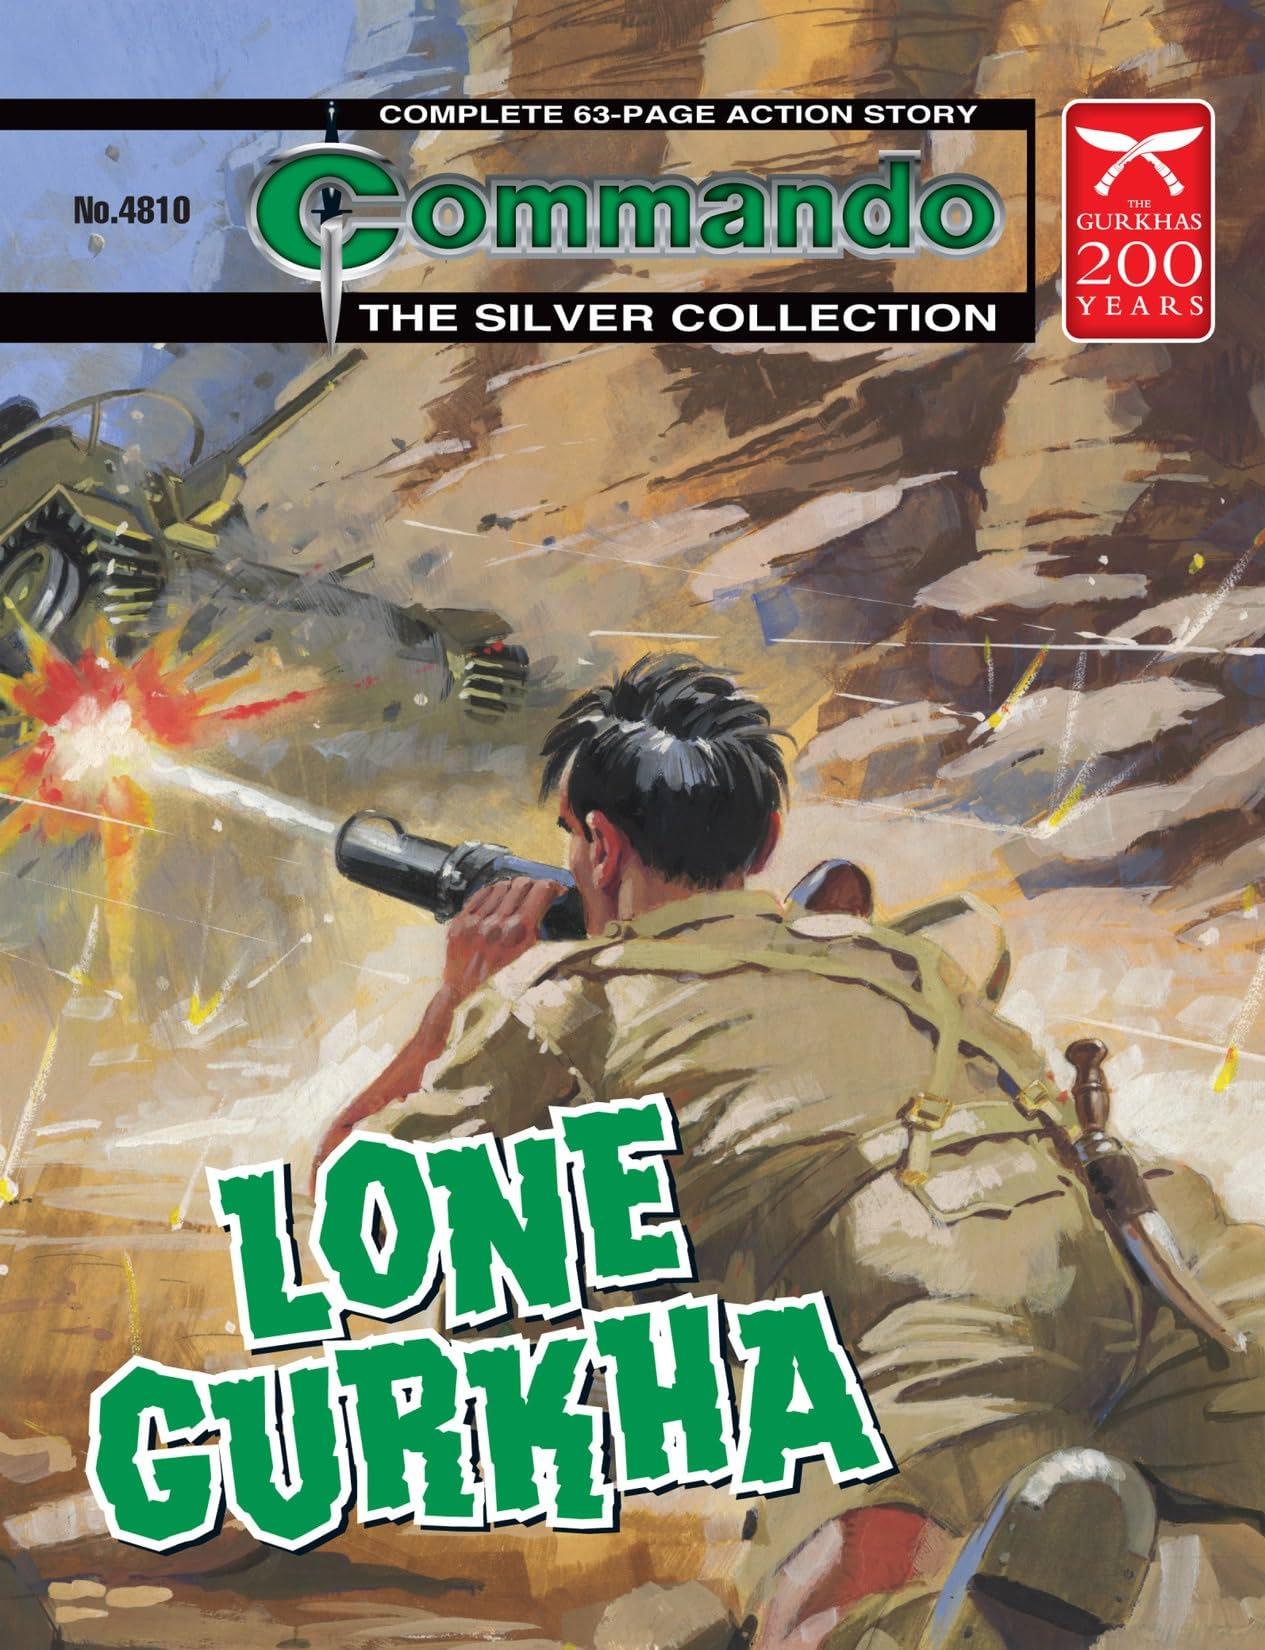 Commando #4810: Lone Gurkha